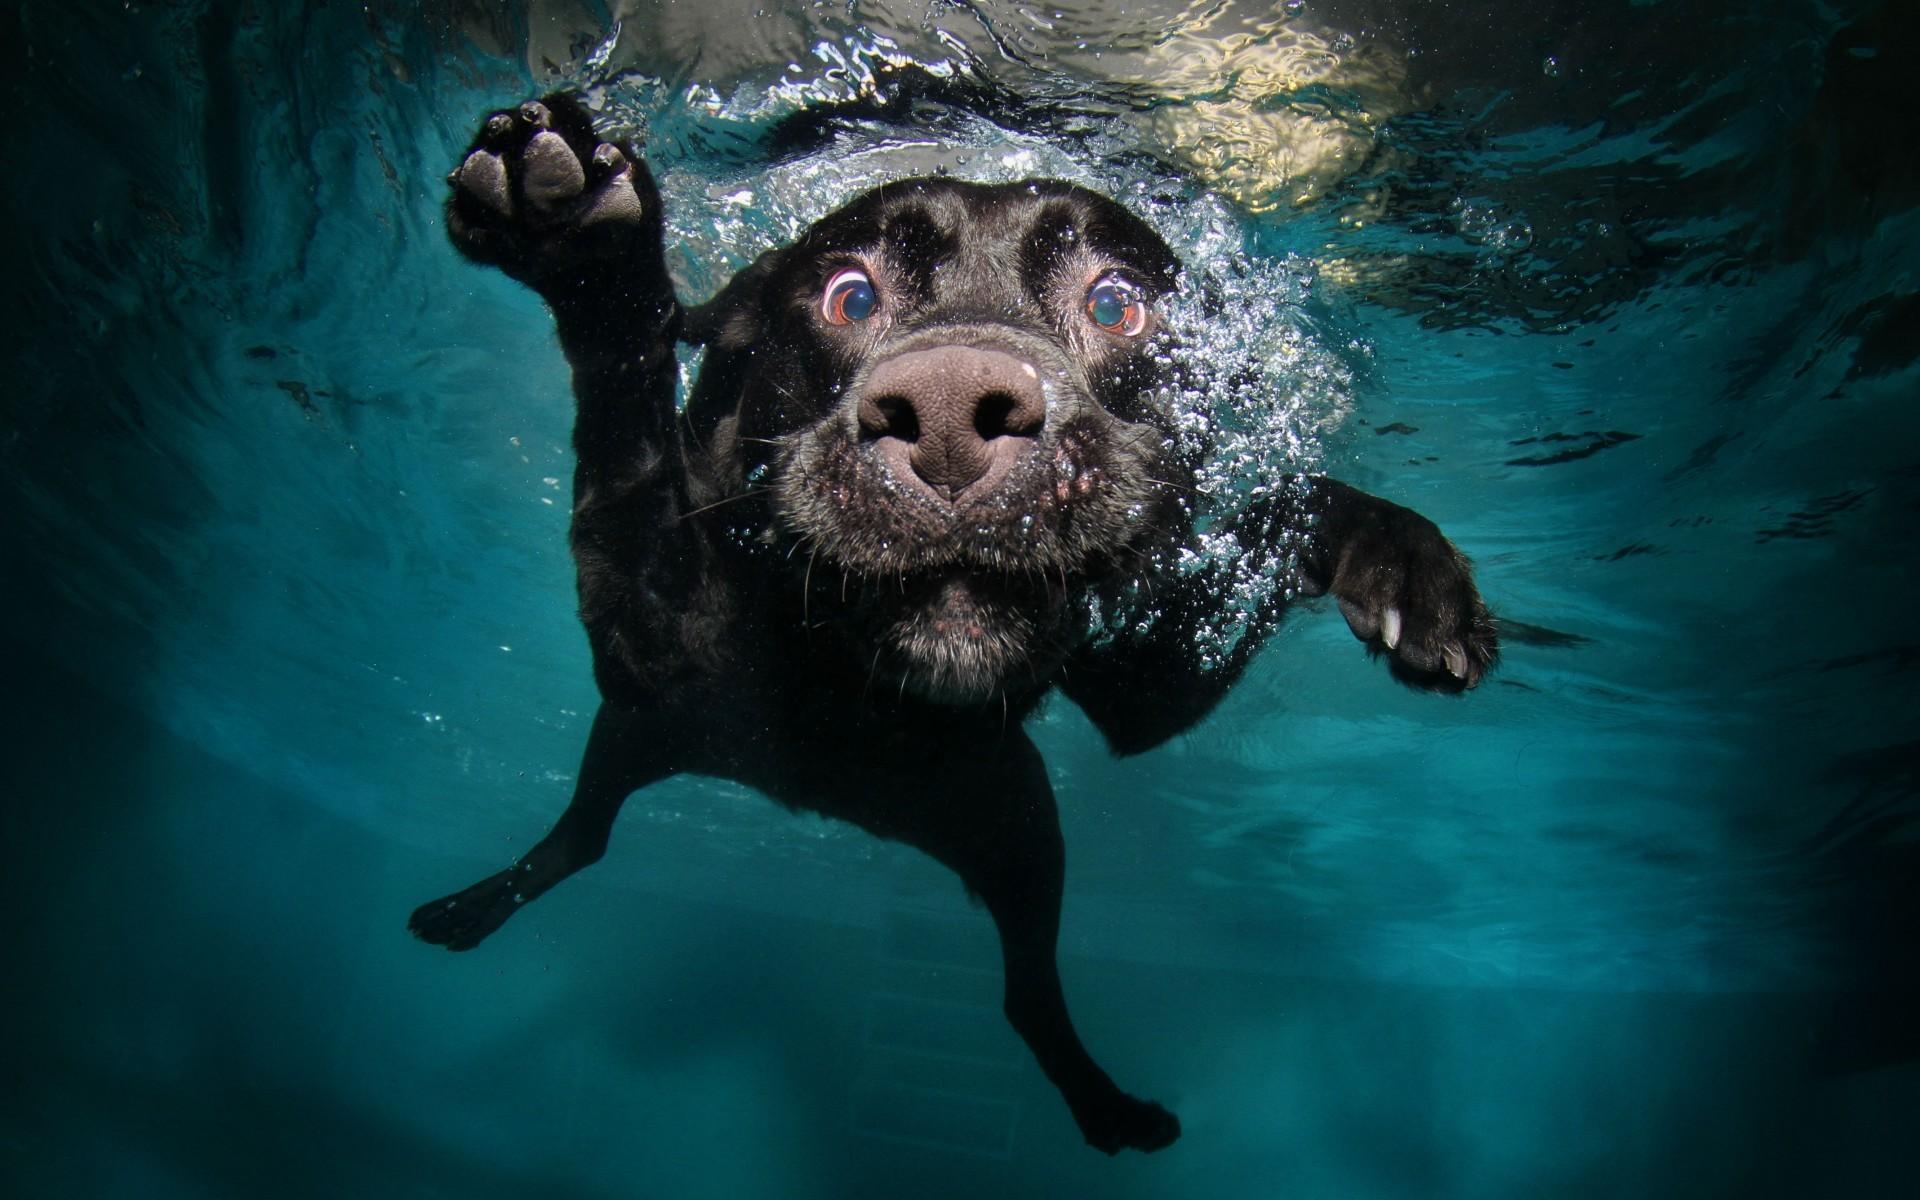 Perro en el agua - 1920x1200